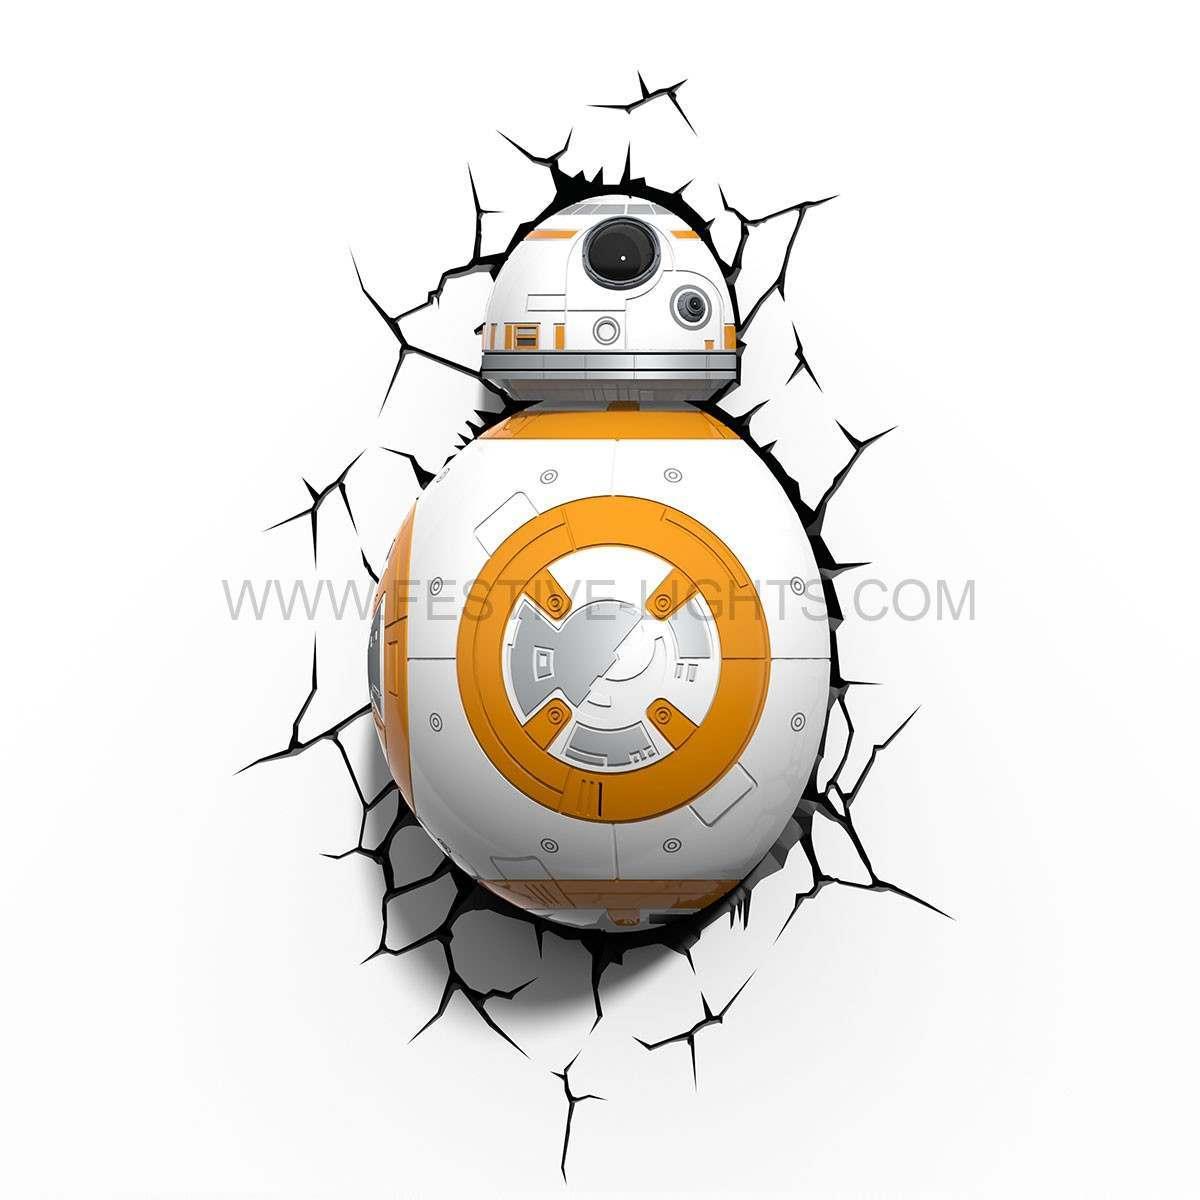 Star Wars: The Force Awakens BB-8 3D LED Battery Wall Deco Night Light